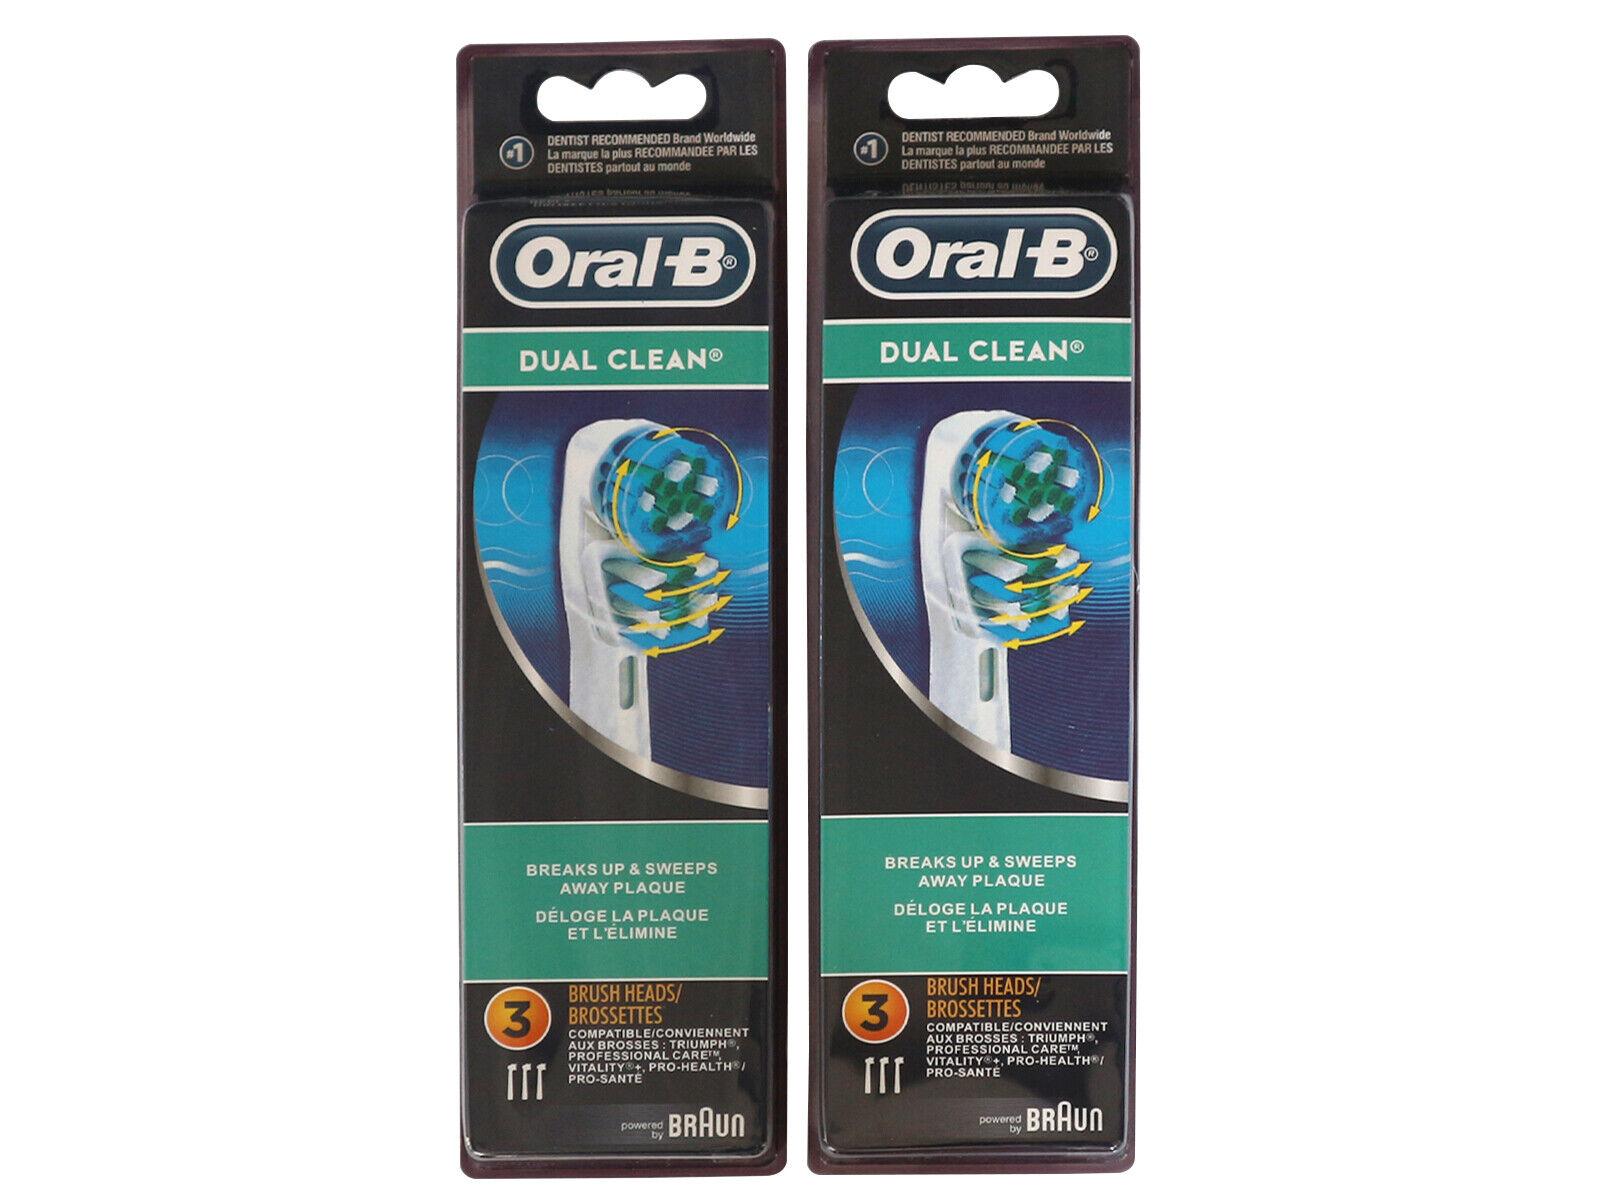 6 BRAUN ORAL B DUAL CLEAN TOOTHBRUSH REPLACEMENT BRUSH HEADS